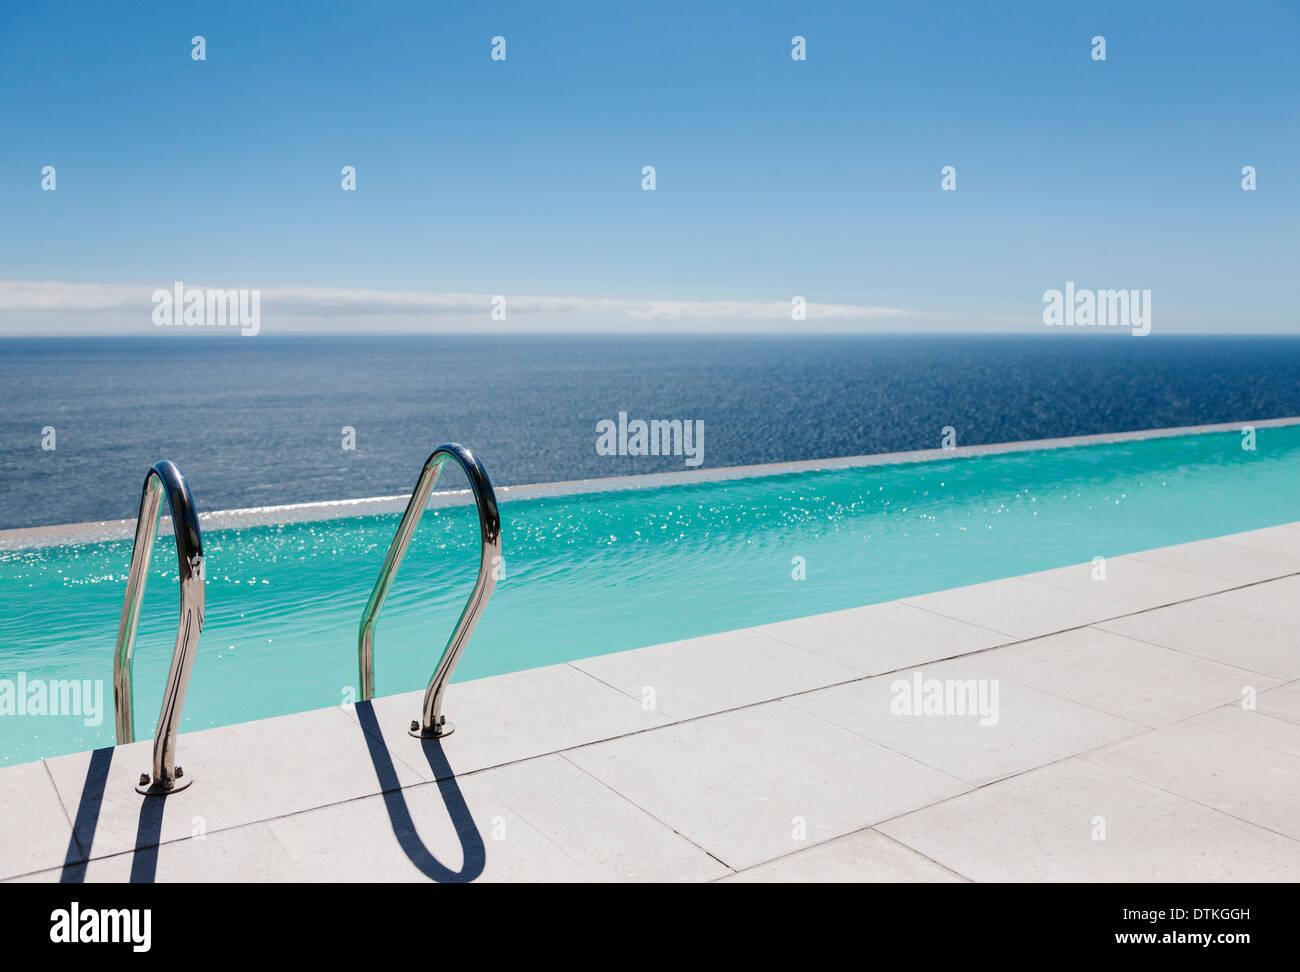 Infinity pool overlooking ocean - Stock Image